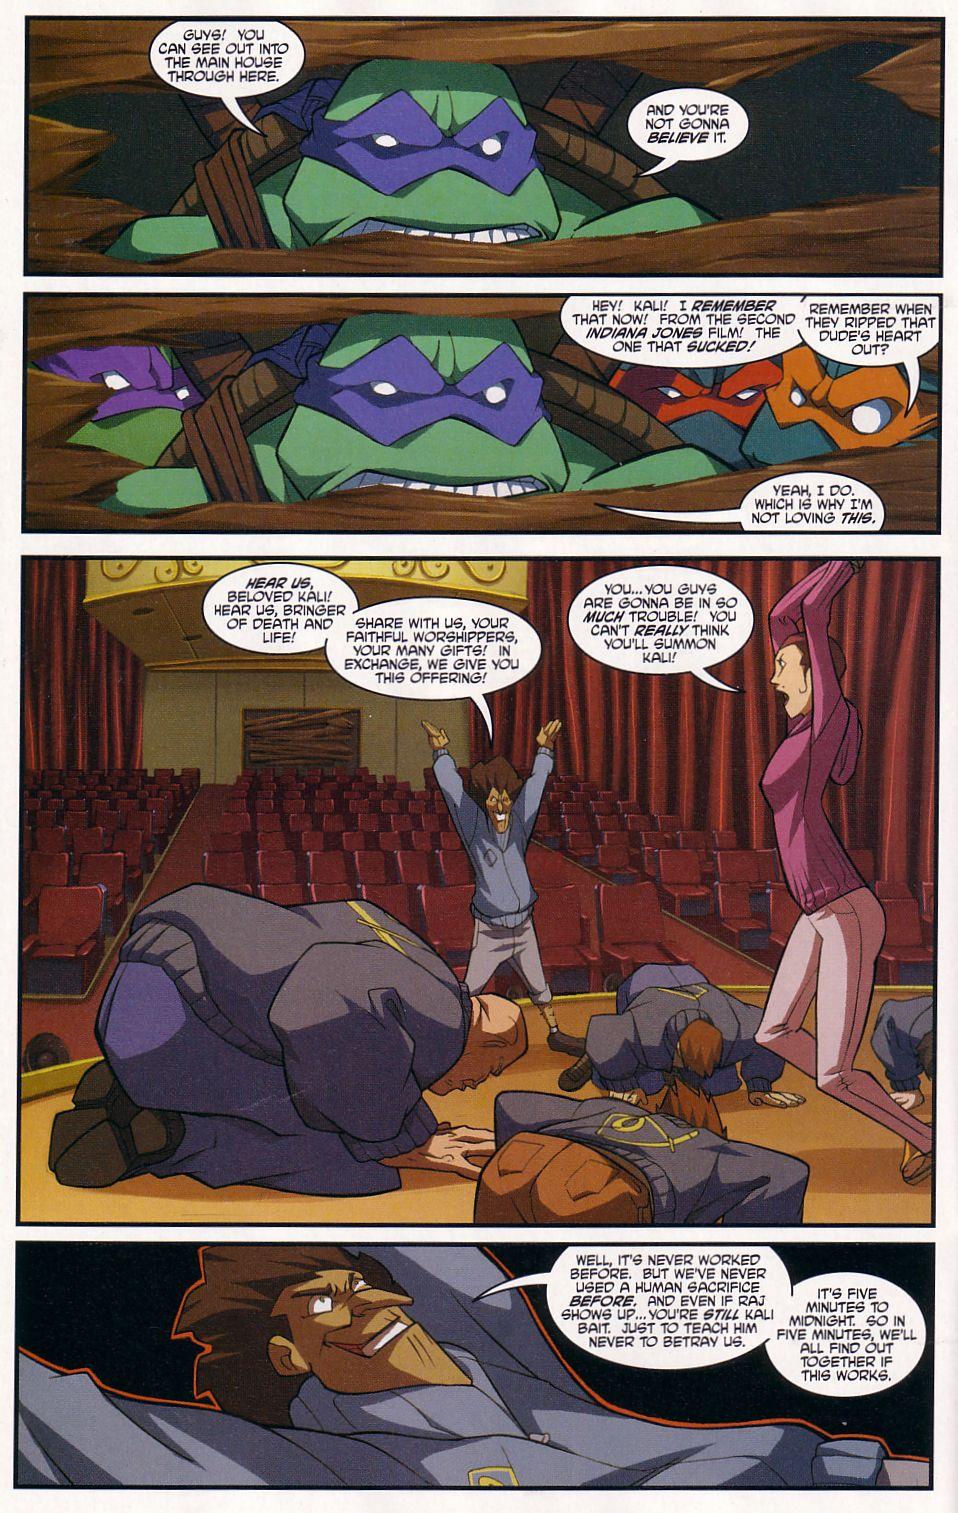 Teenage Mutant Ninja Turtles (2003) chap 7 pic 16